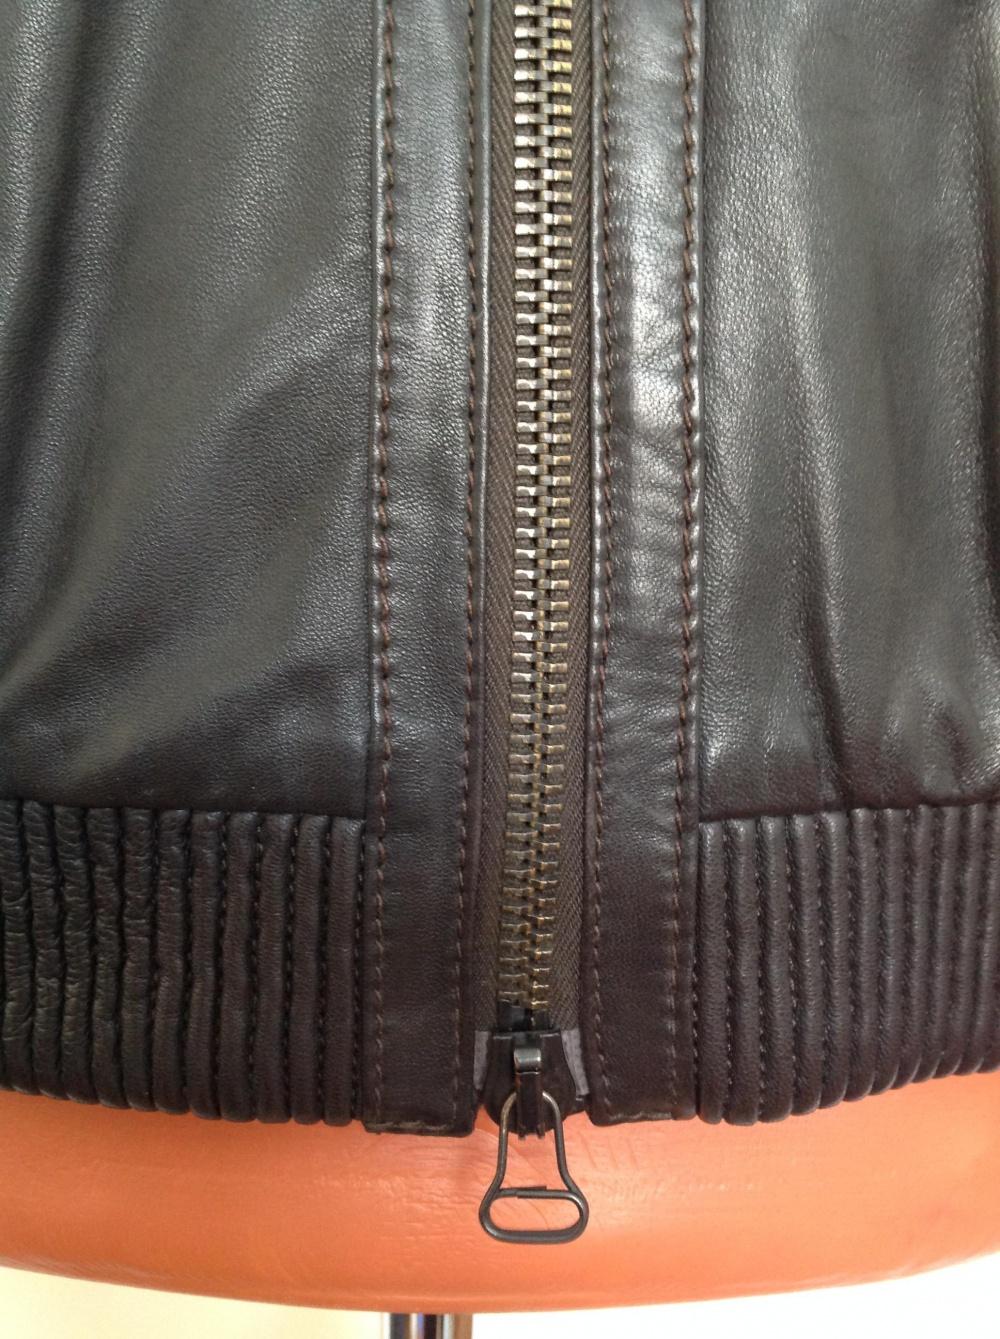 Кожаная куртка бомбер GF Ferre, размер 46IT, на 46-48